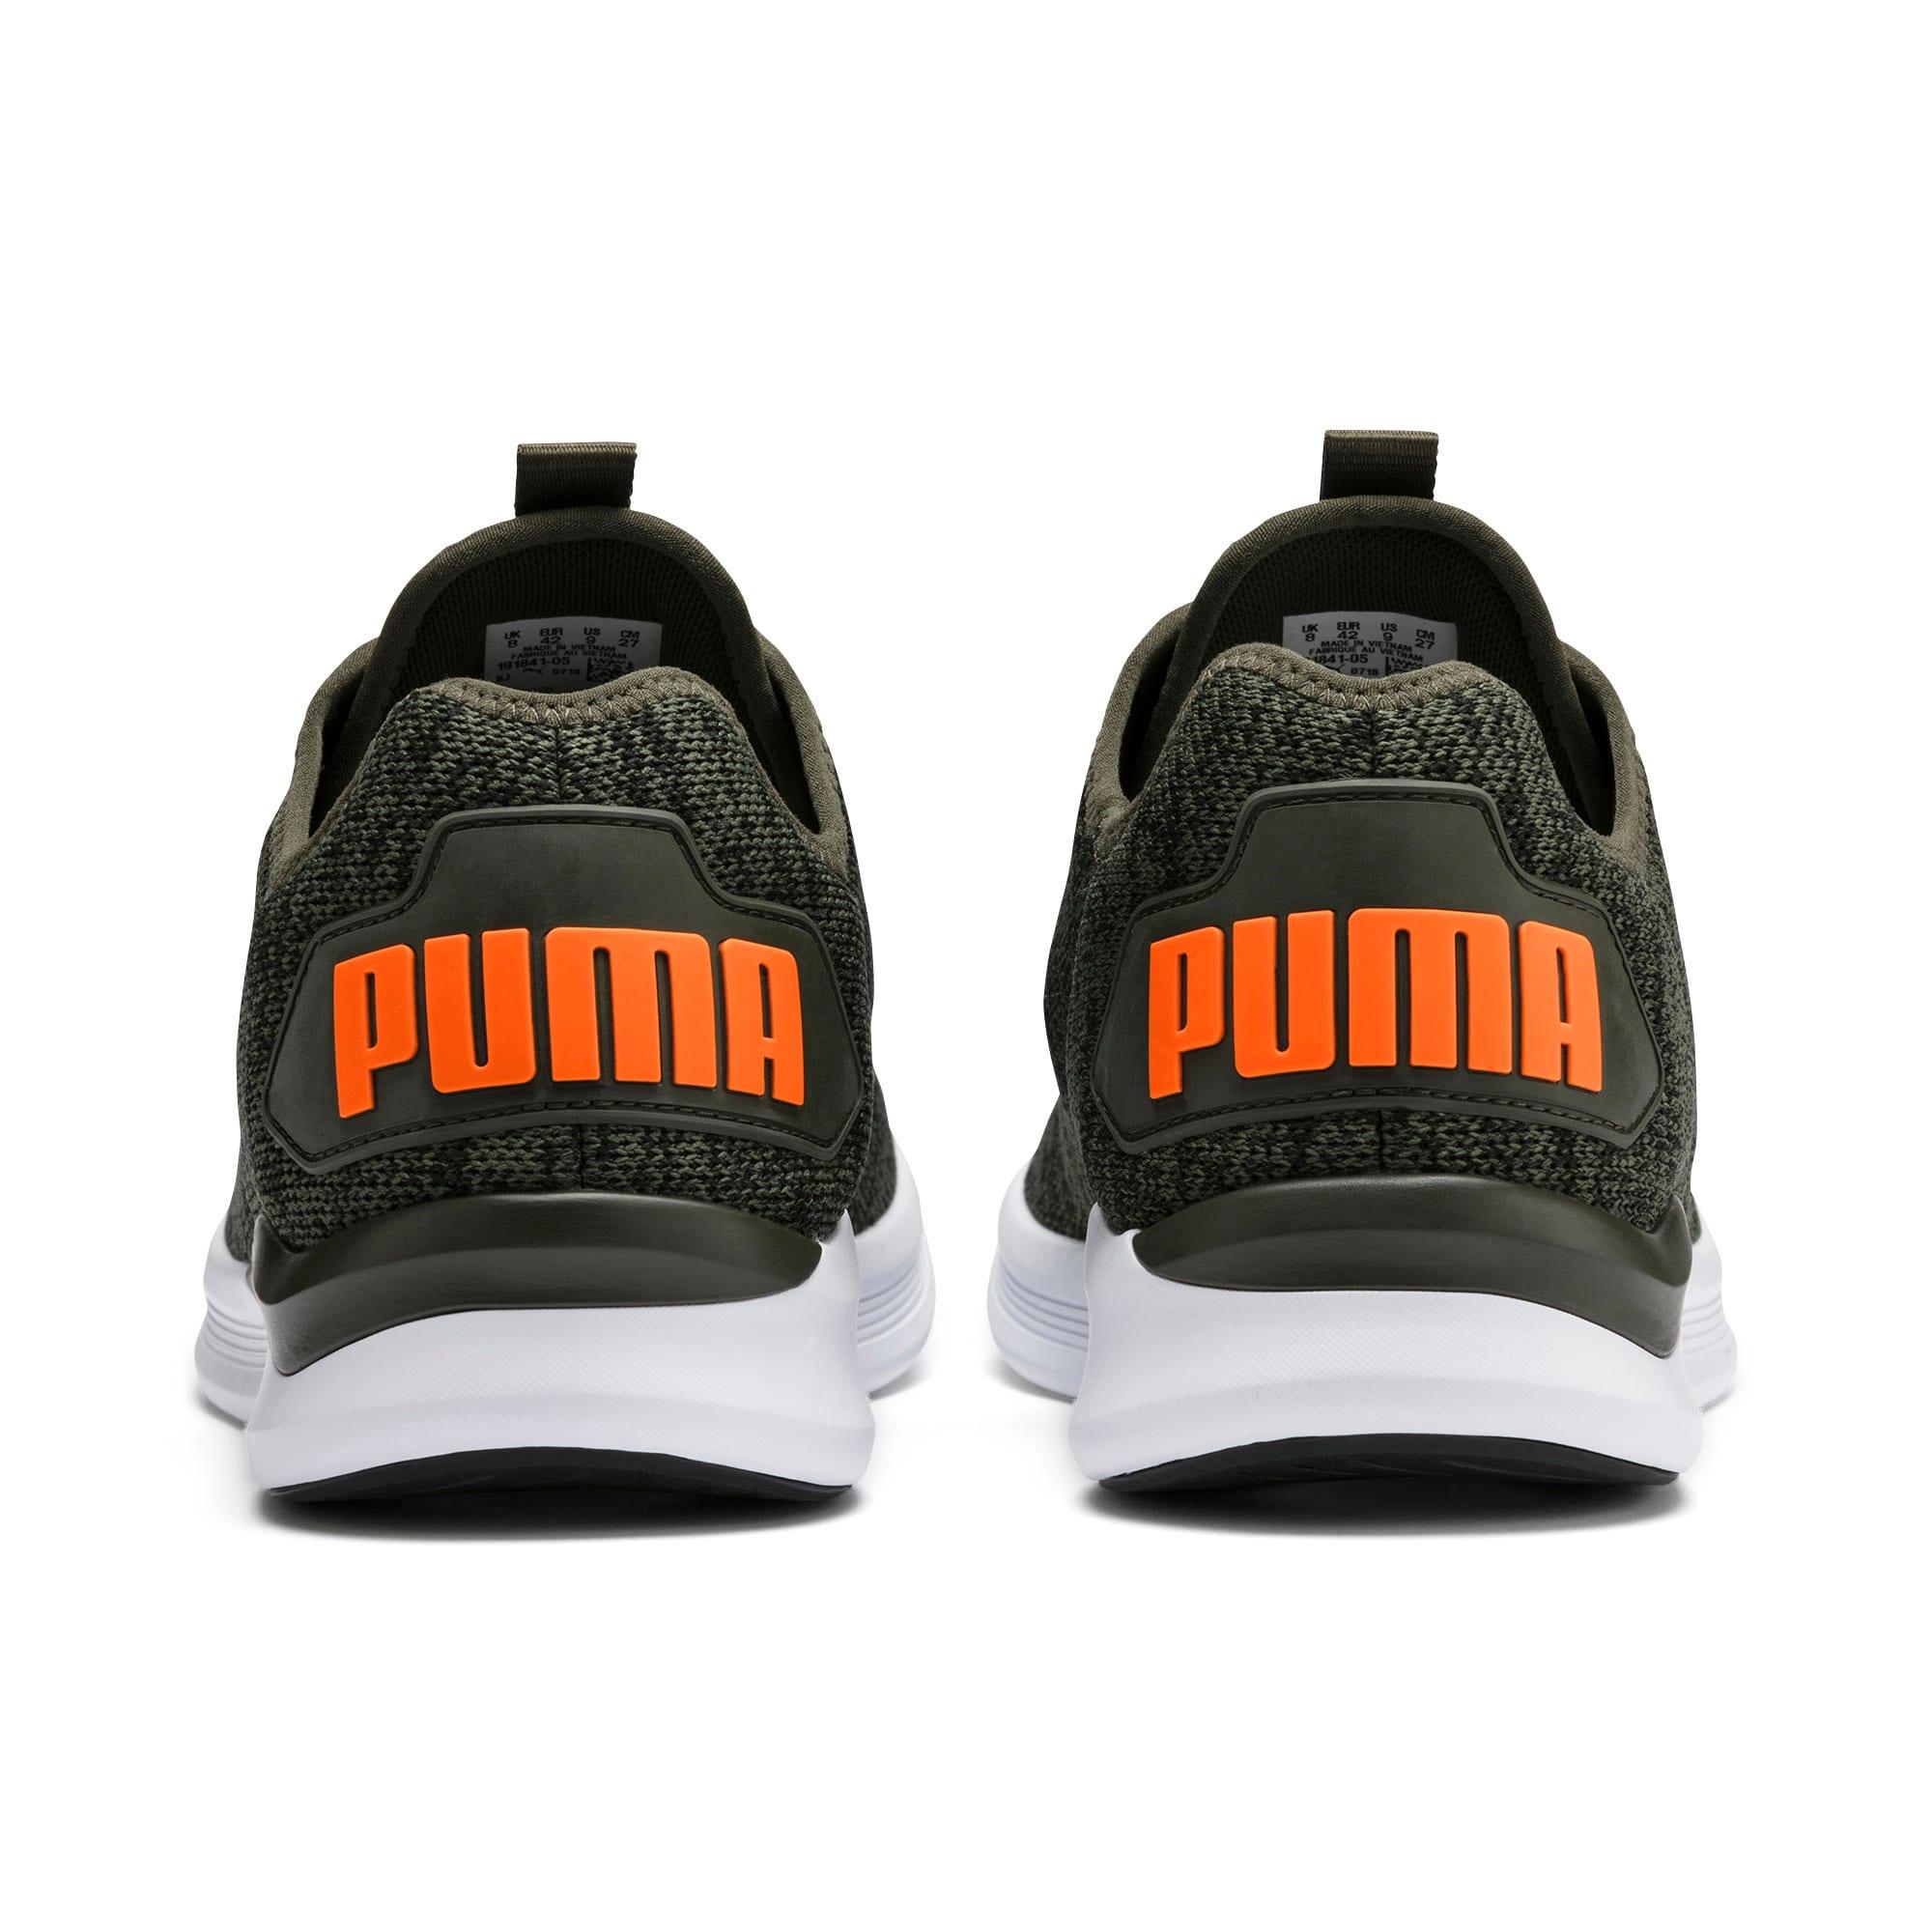 Thumbnail 5 of Ballast Men's Running Shoes, Forest Night-Black-Orange, medium-IND